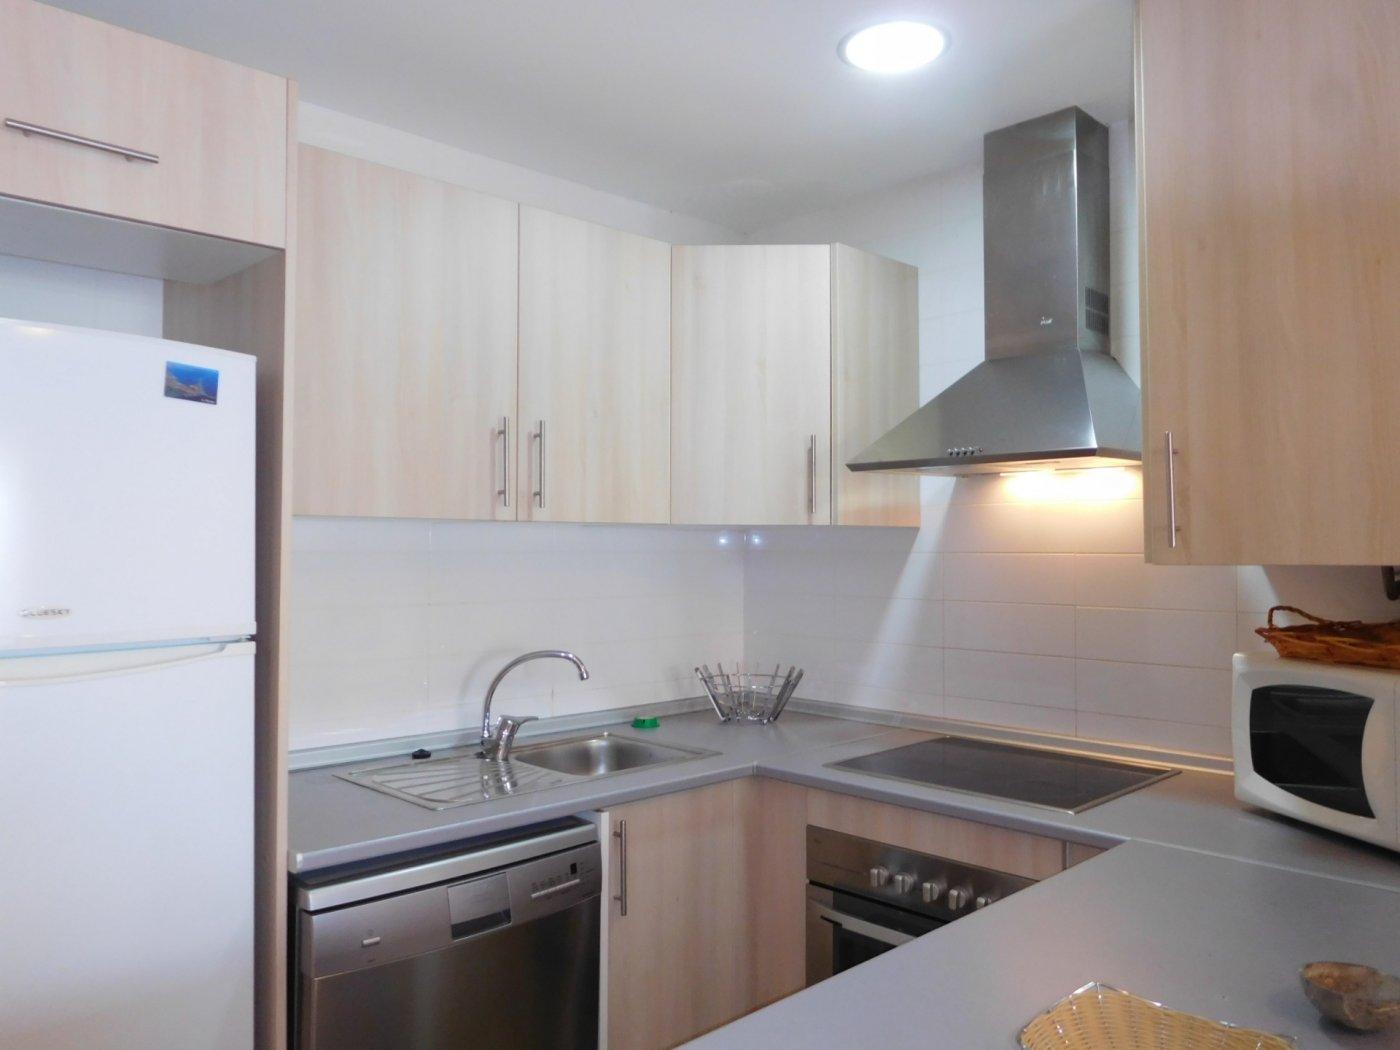 Gallery Image 4 of Apartment For rent in Condado De Alhama, Alhama De Murcia With Pool